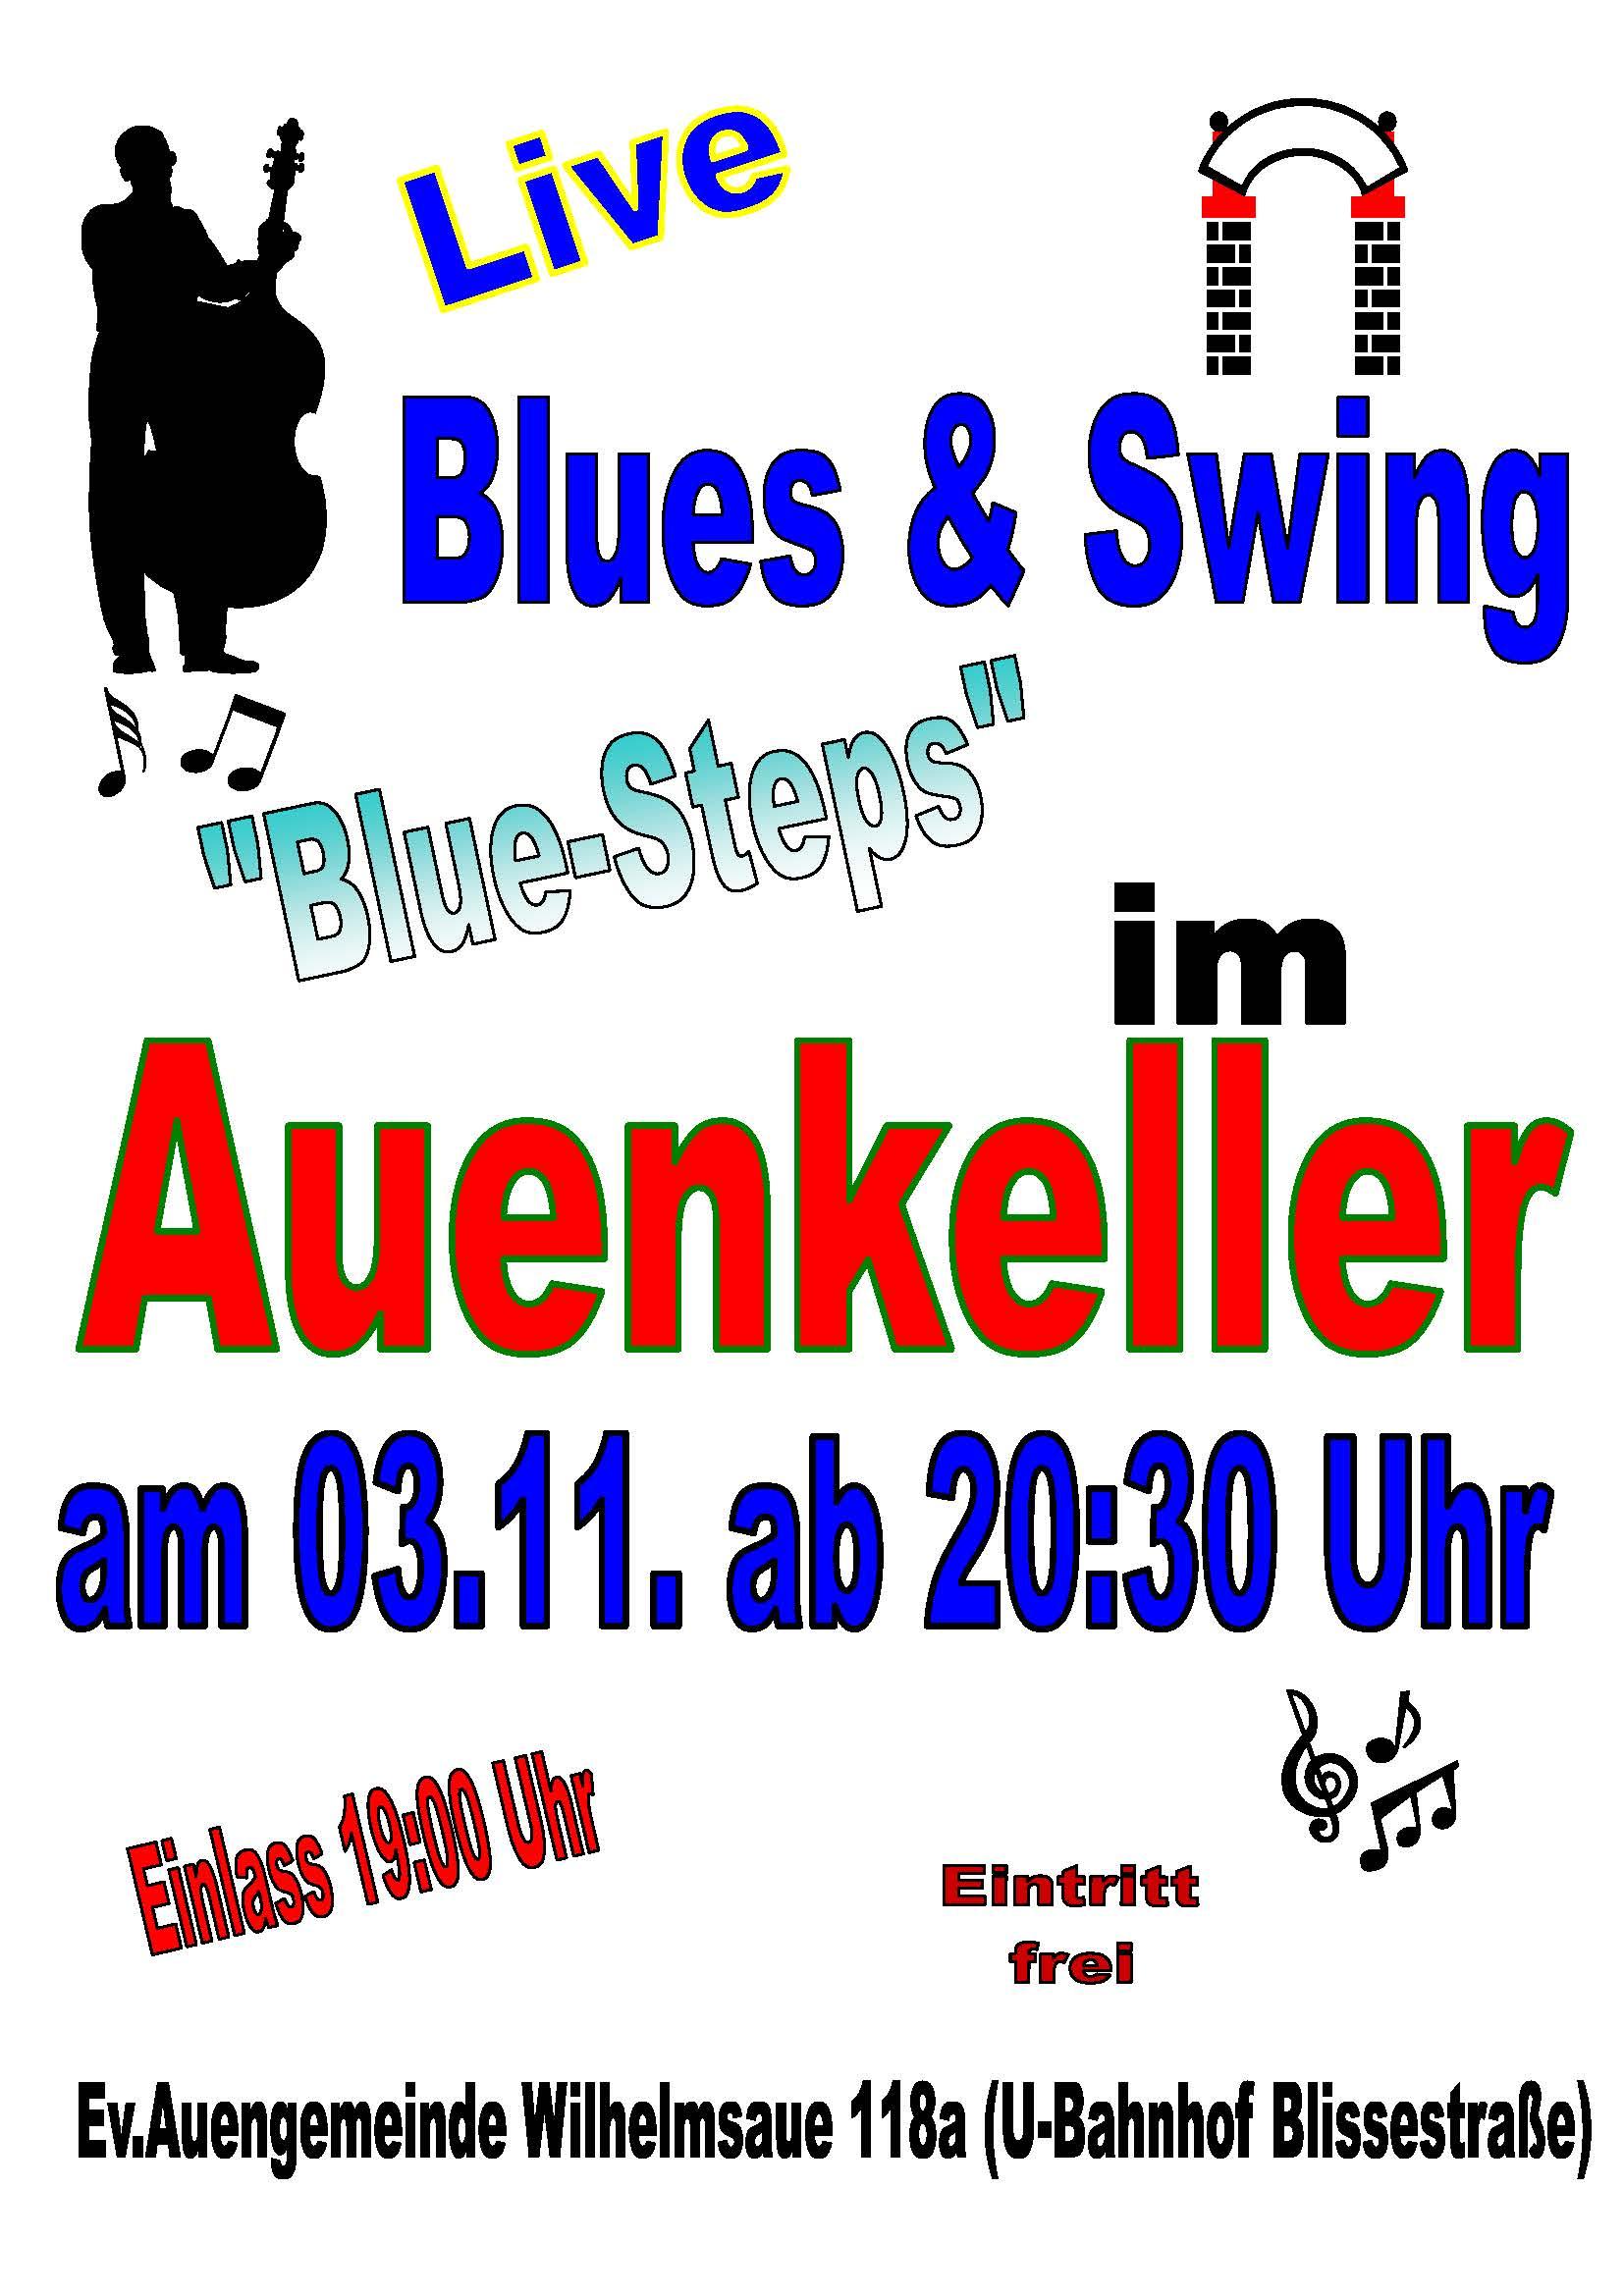 Blue Steps To Success: Auenkeller